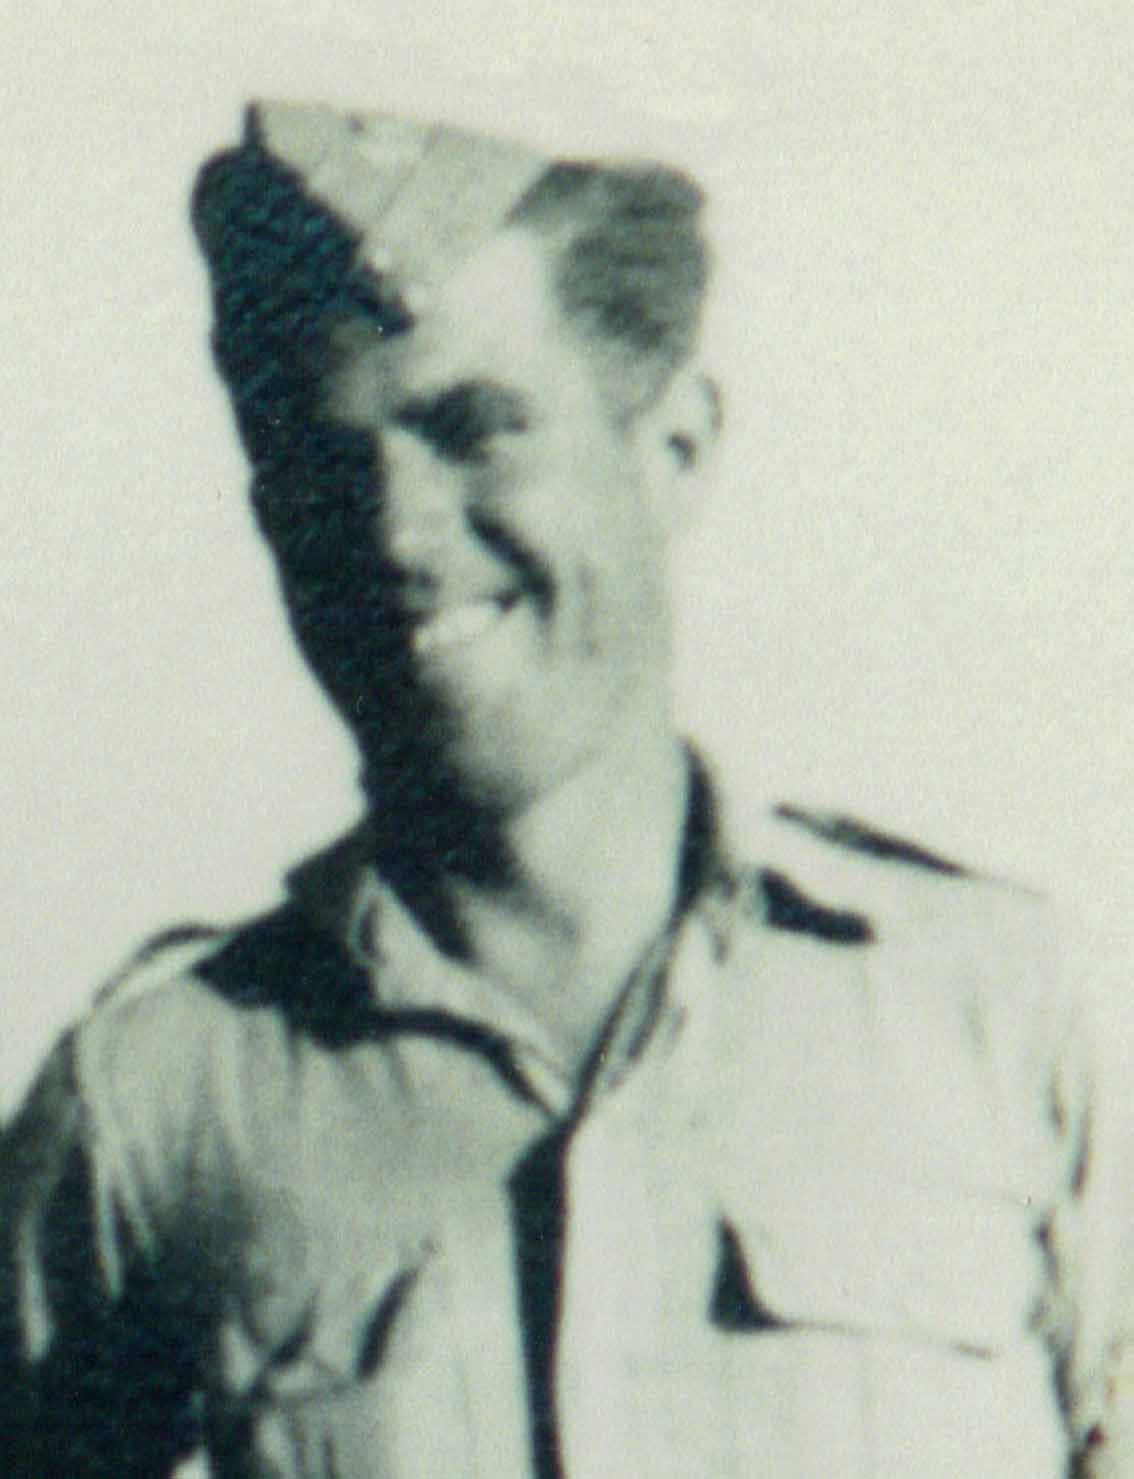 Sgt Burns WW2 diary war story book